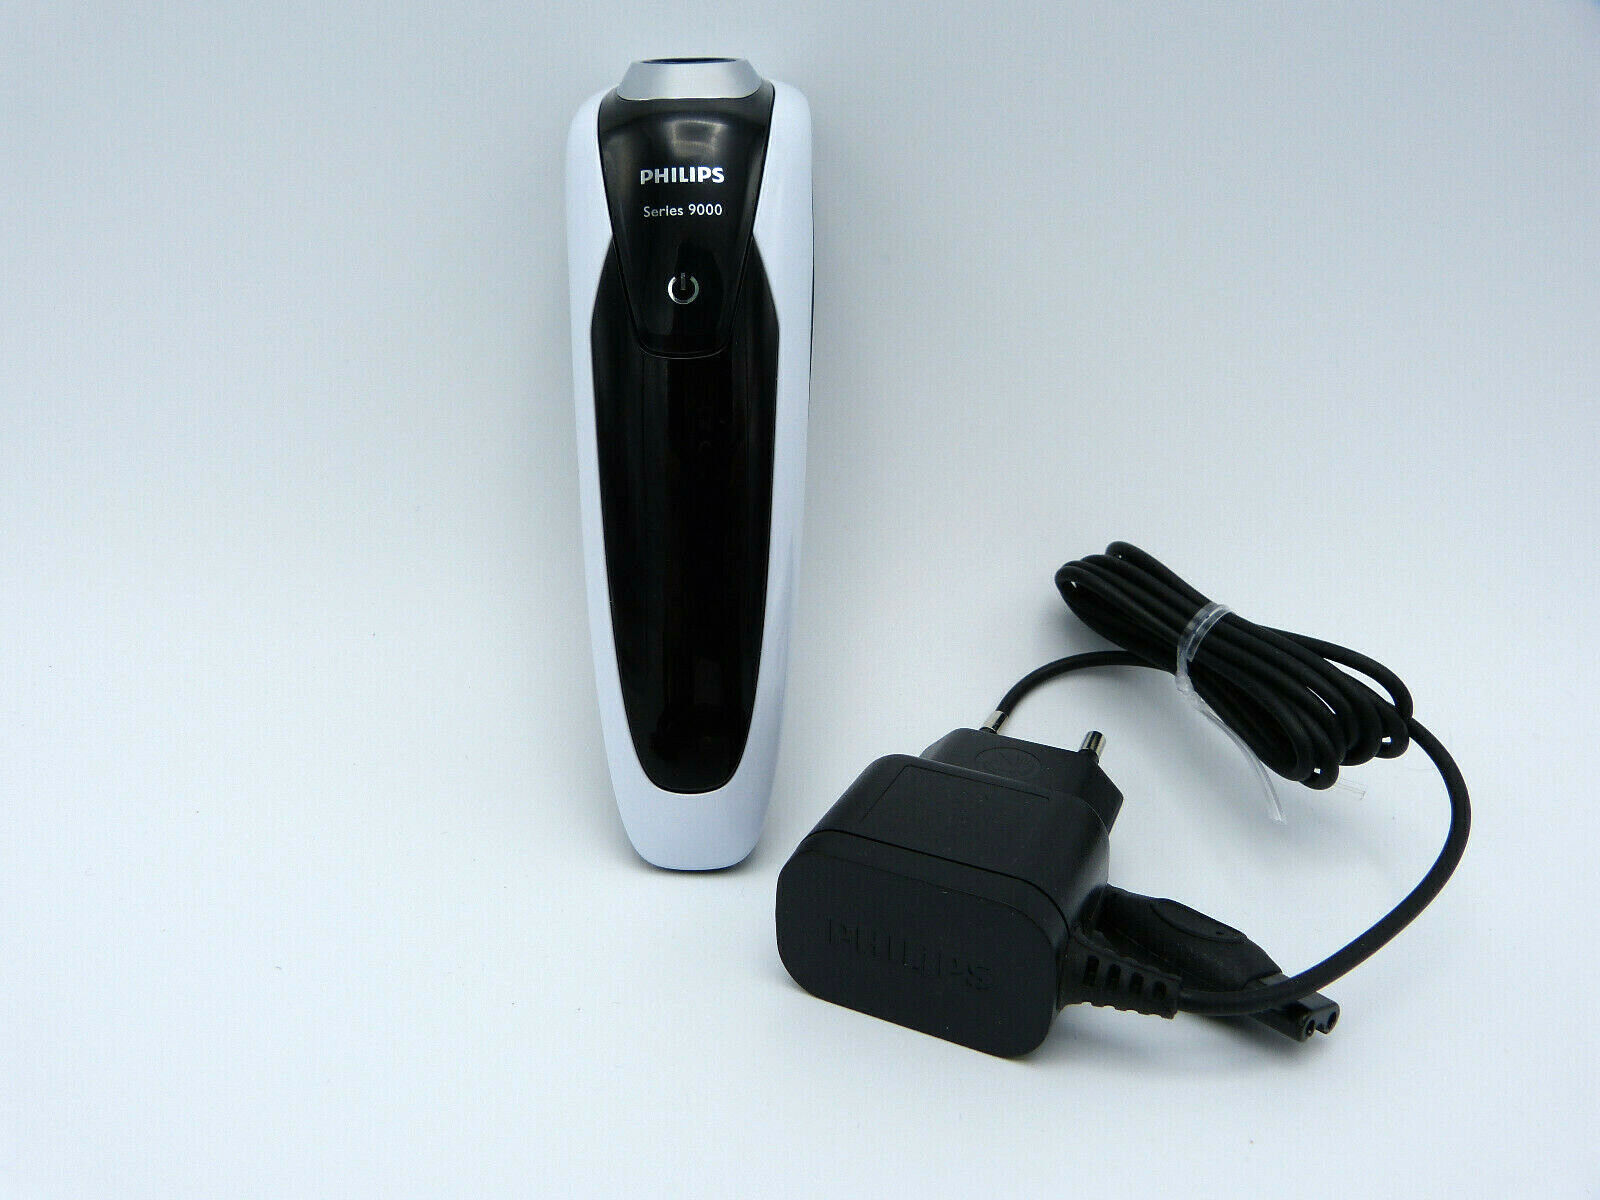 Philips Shaver Series 9000 S9121 elektrischer Nassrasierer Trockenrasierer